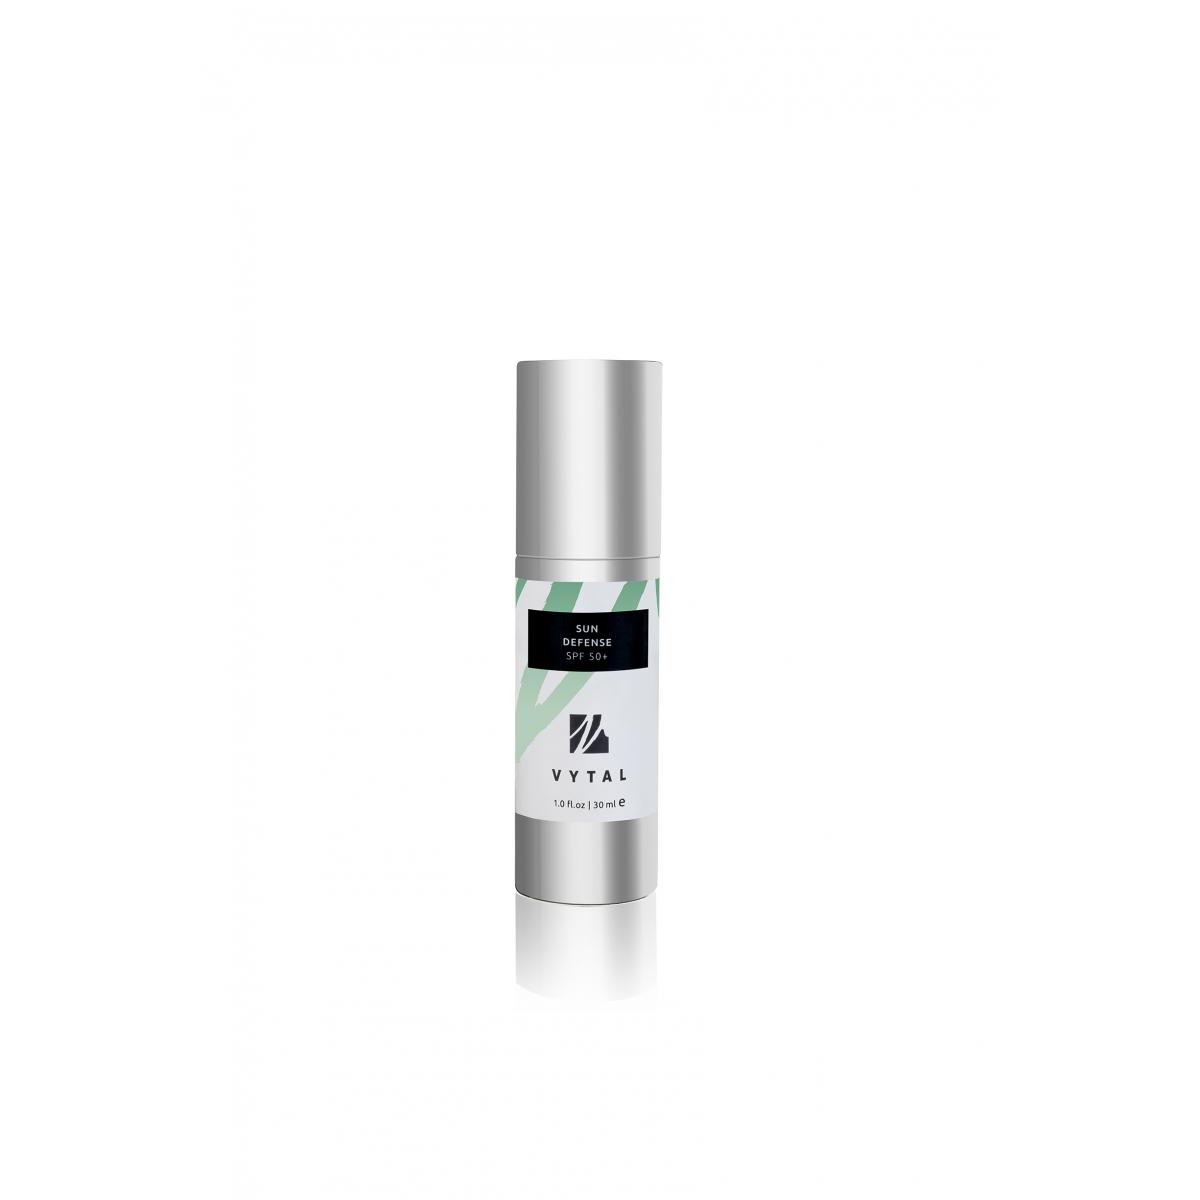 Vytal Skin - Vytal Skin - SUN DEFENSE SPF 50+ (30 ml)